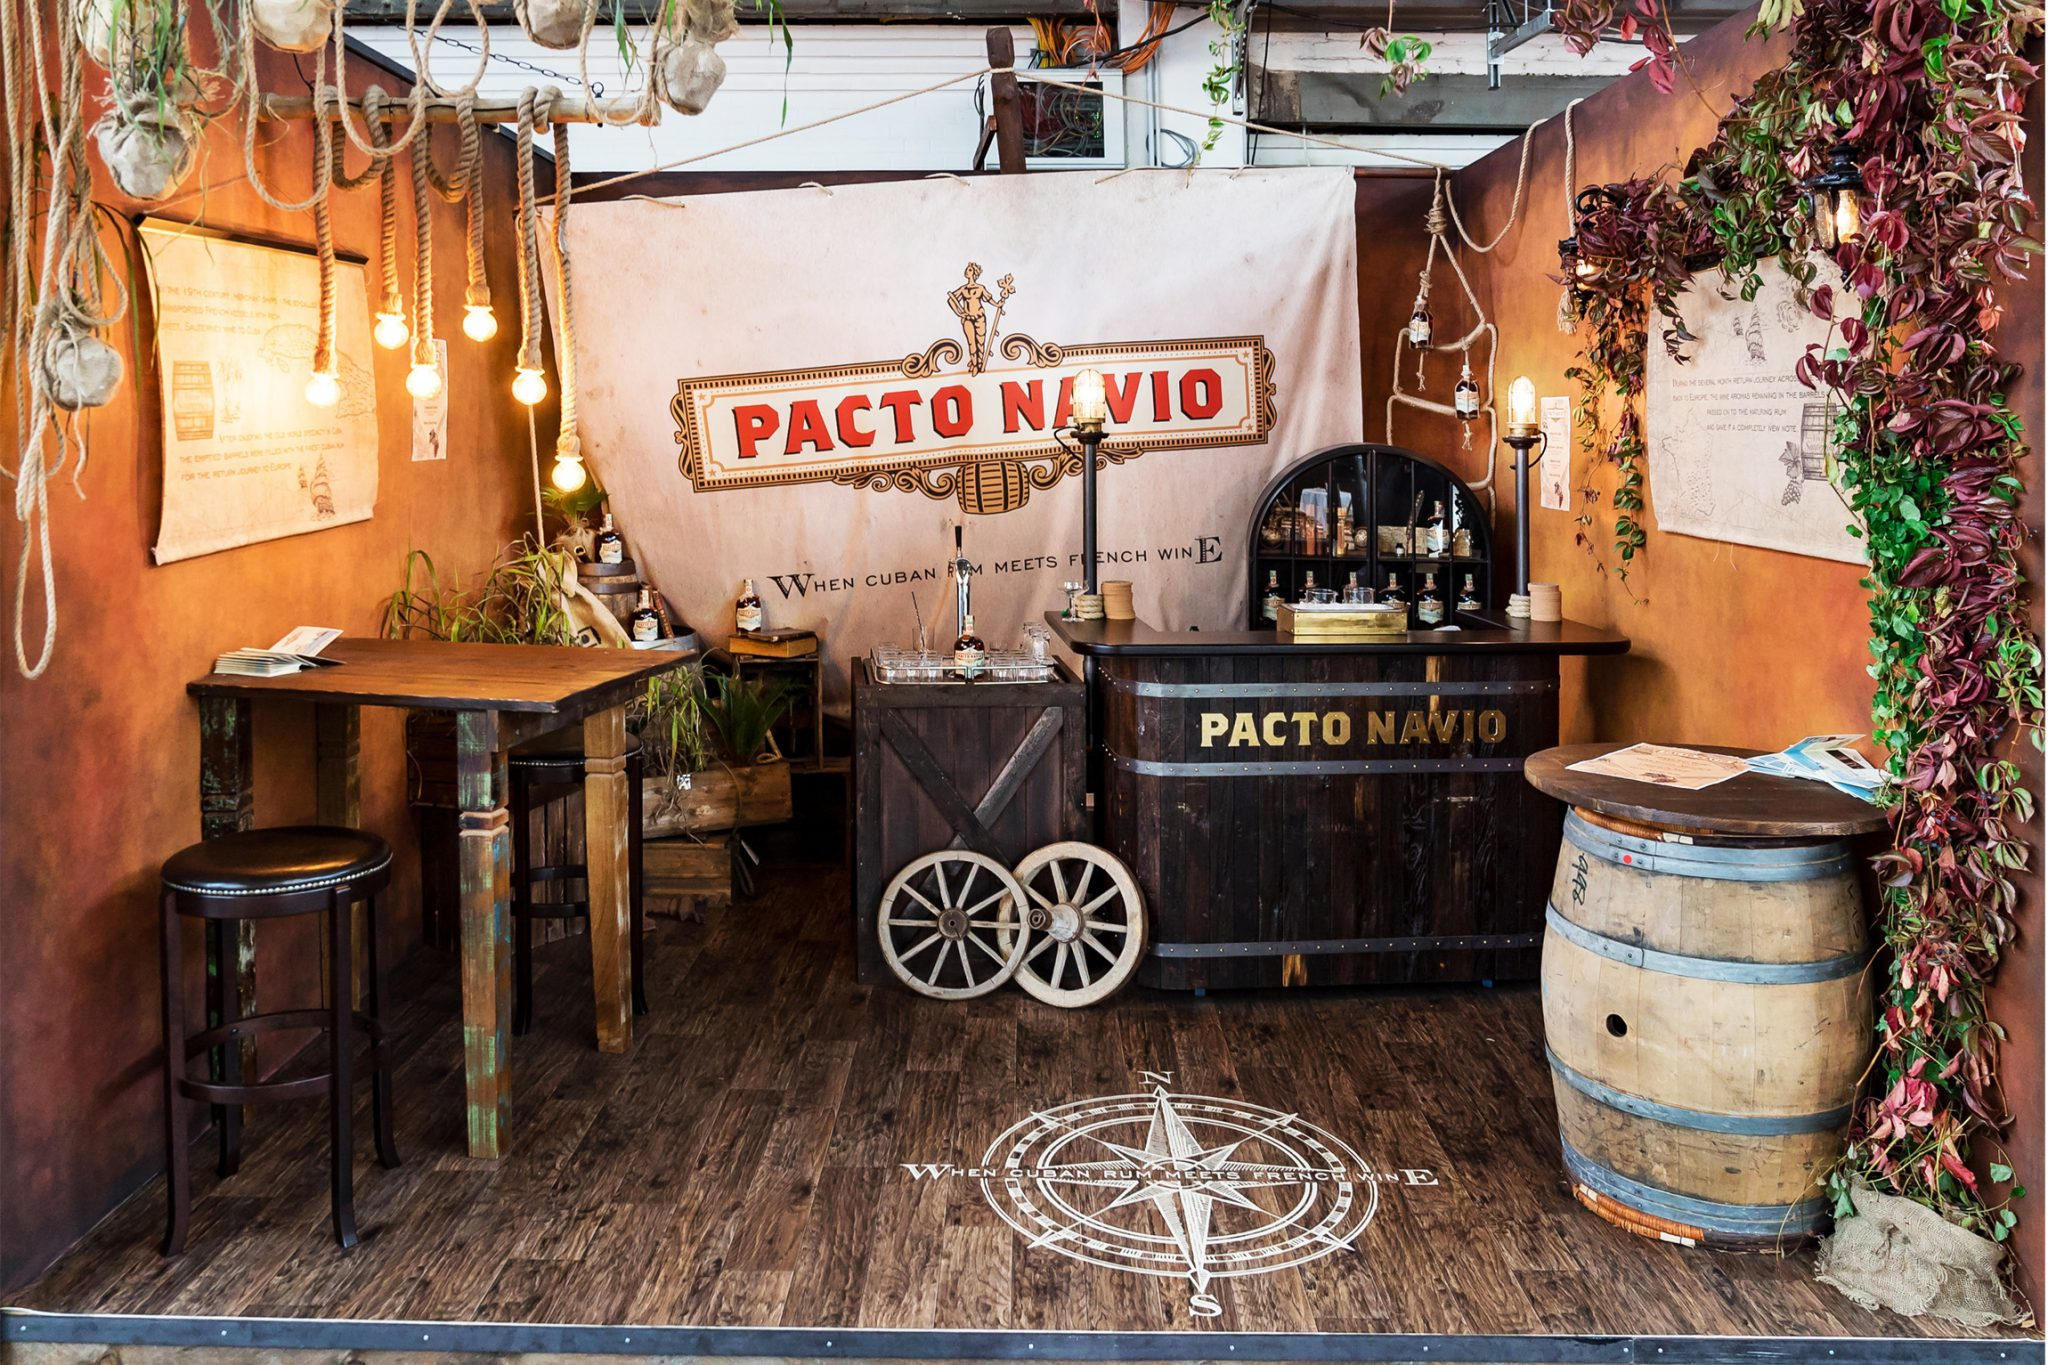 Pacto Navio BCB 2018, Design Stil Manipulation 2018, Bar Convent, Messestand Design